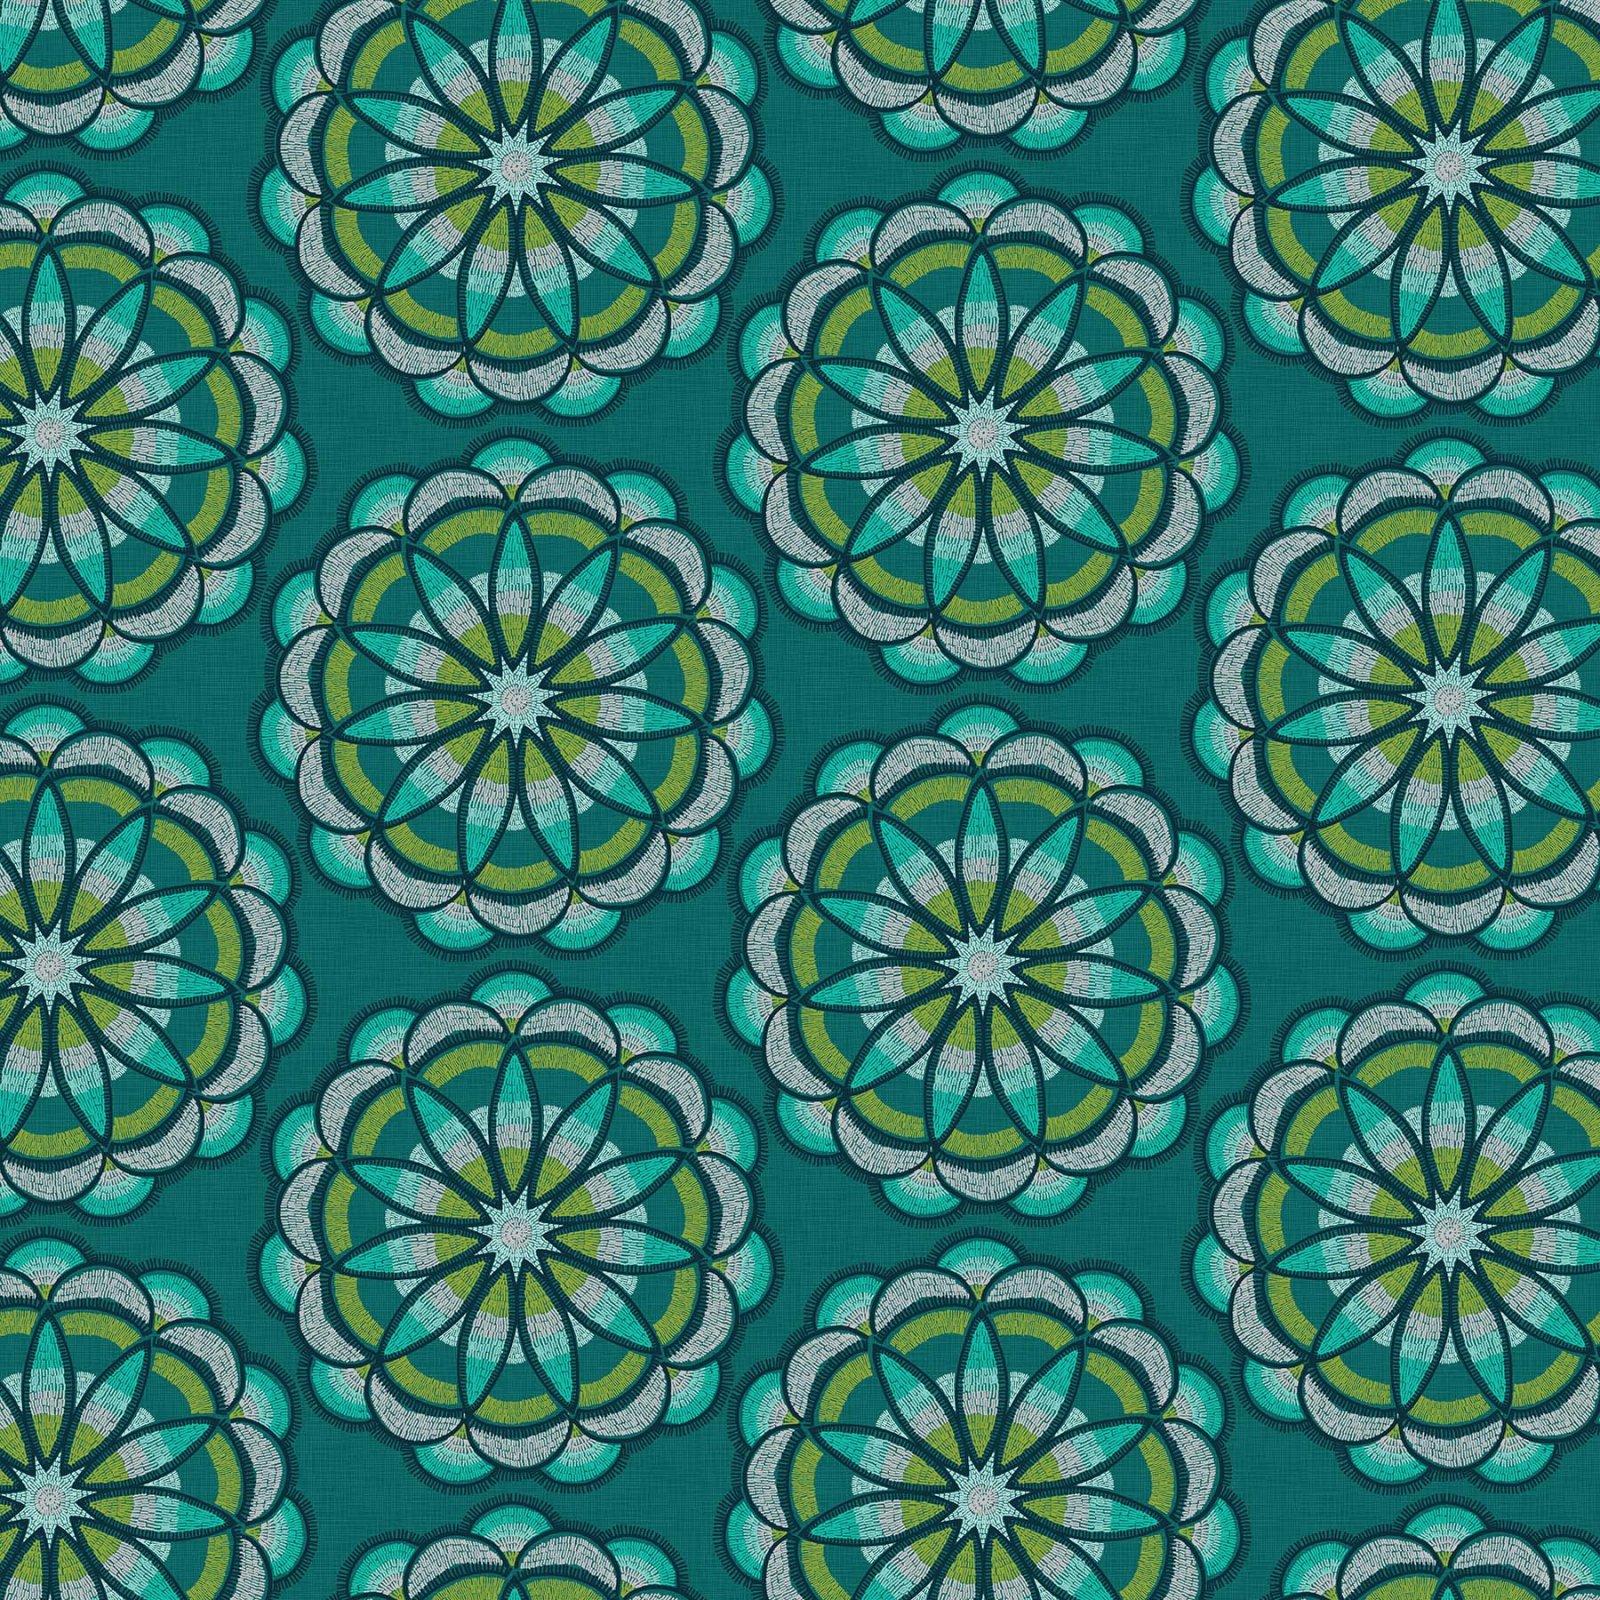 Nina Djuric Great Plains - Teal Flower Print - 22935-64